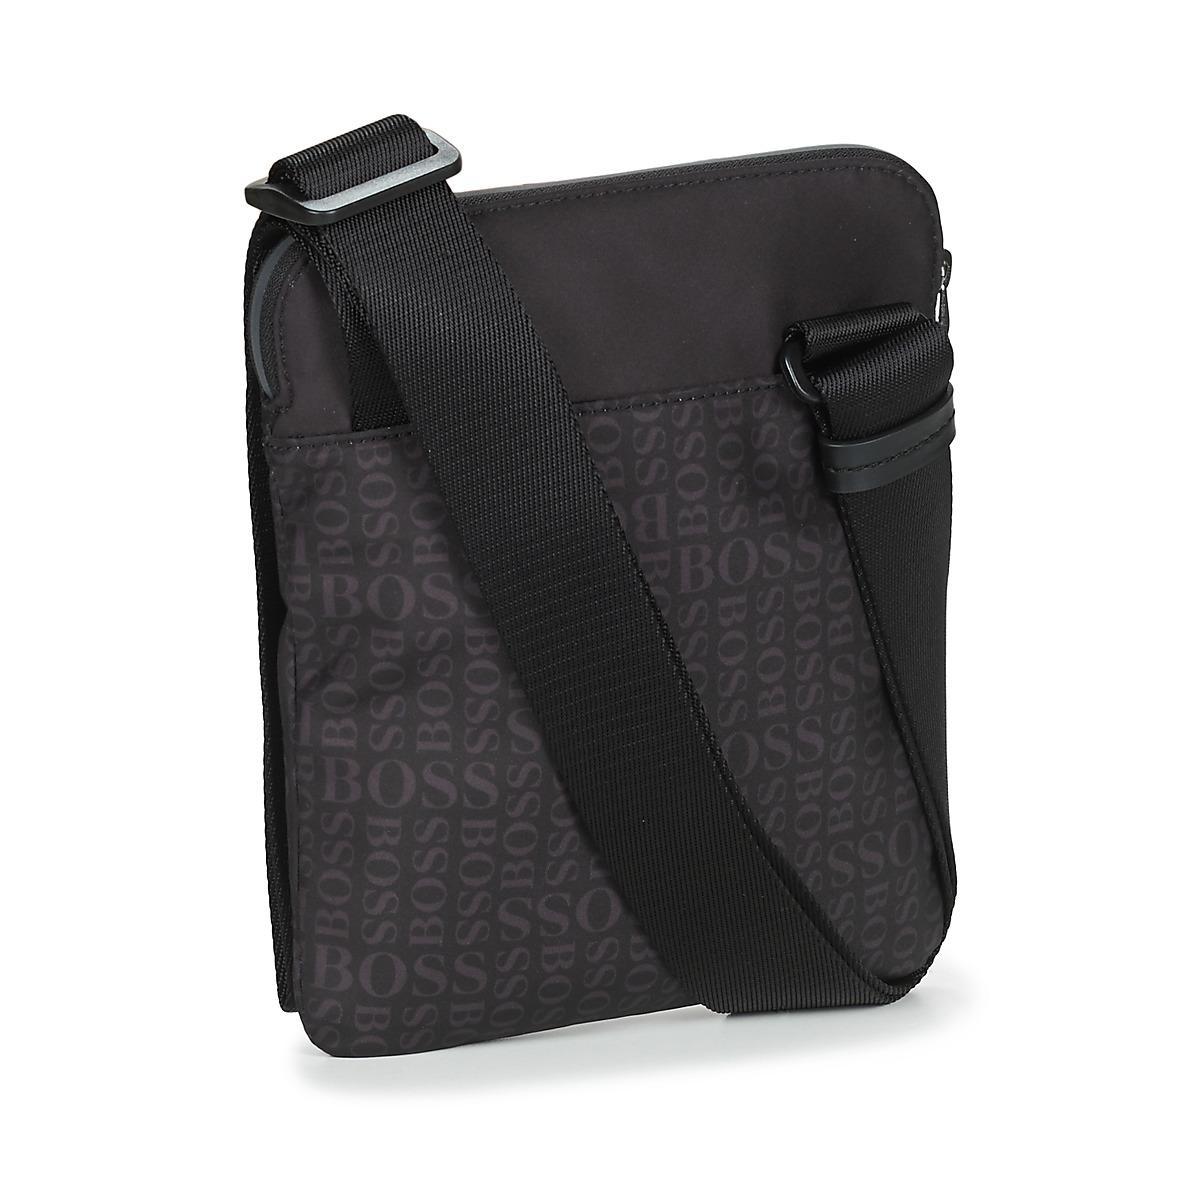 6177346118 BOSS Athleisure - Black Lighter S Zip Env Pouch for Men - Lyst. View  fullscreen